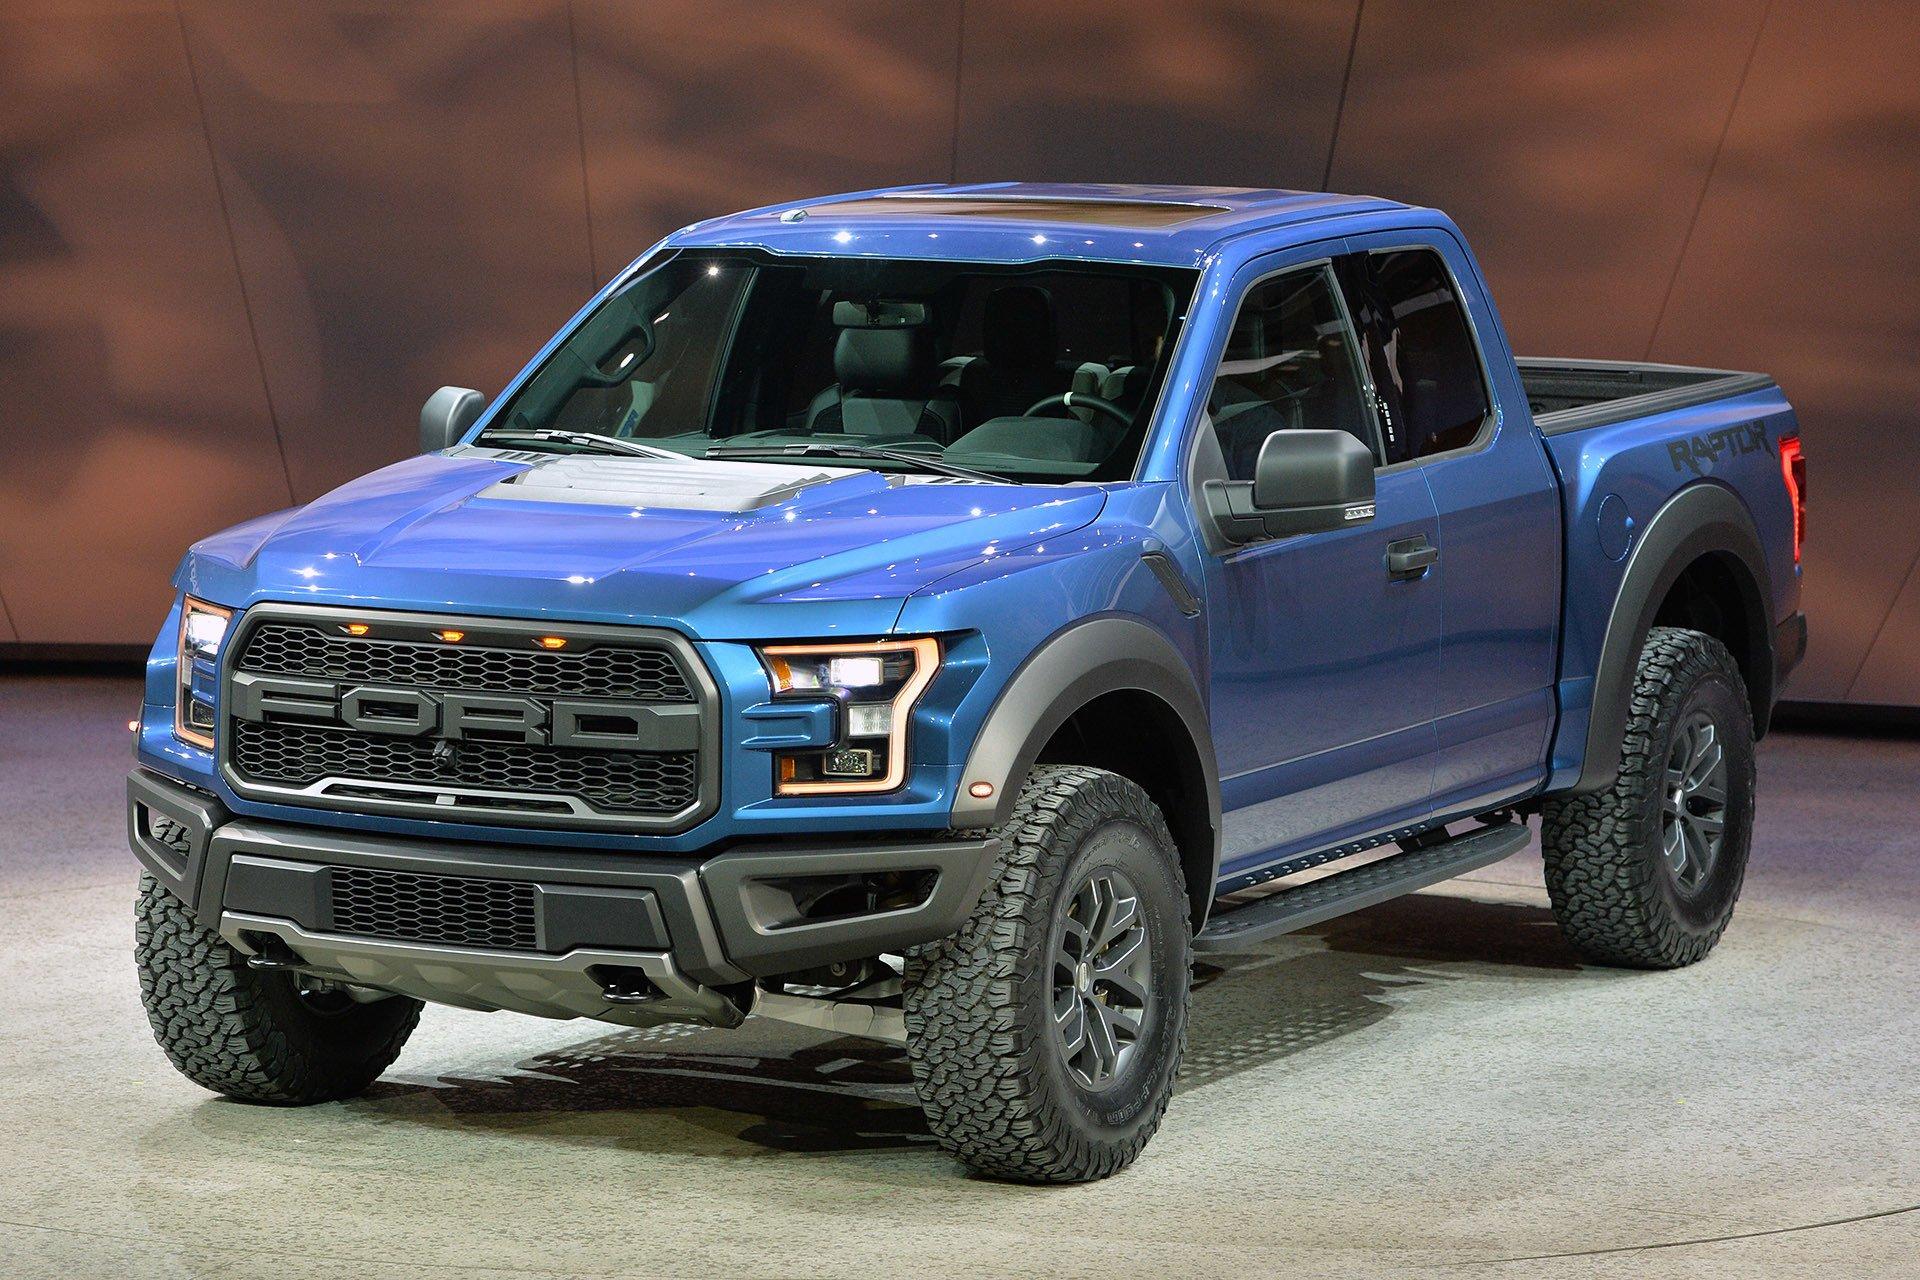 Ford f 150 raptor 2017 truck pickup cars wallpaper background